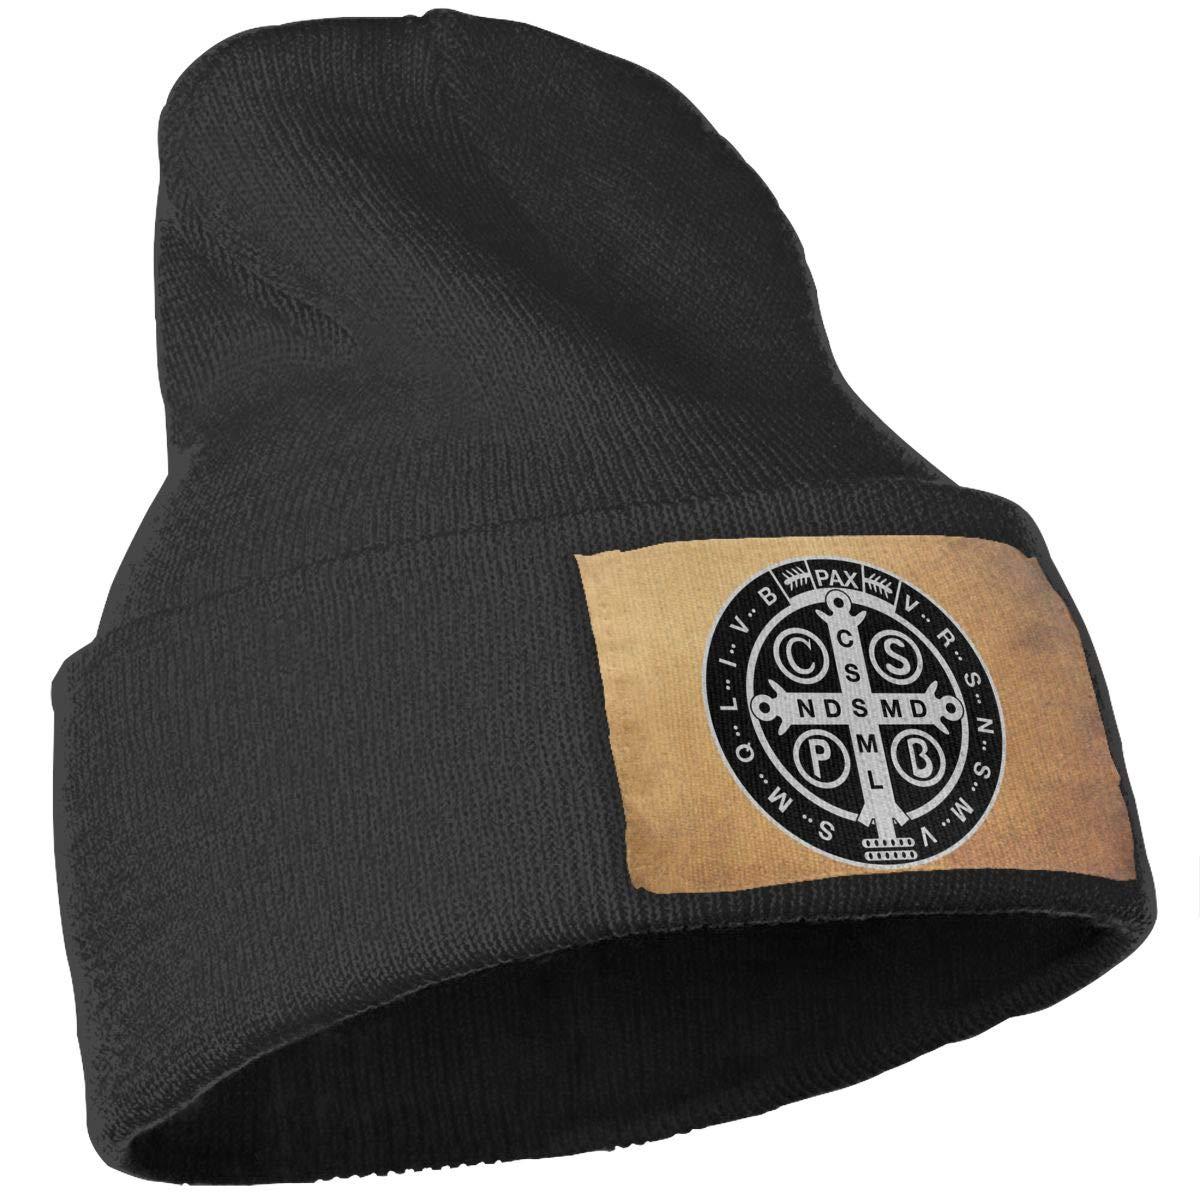 Saint Benedict Medal Beanie Hat Men /& Women Stylish Cap Wrinkled Slouchy Hats